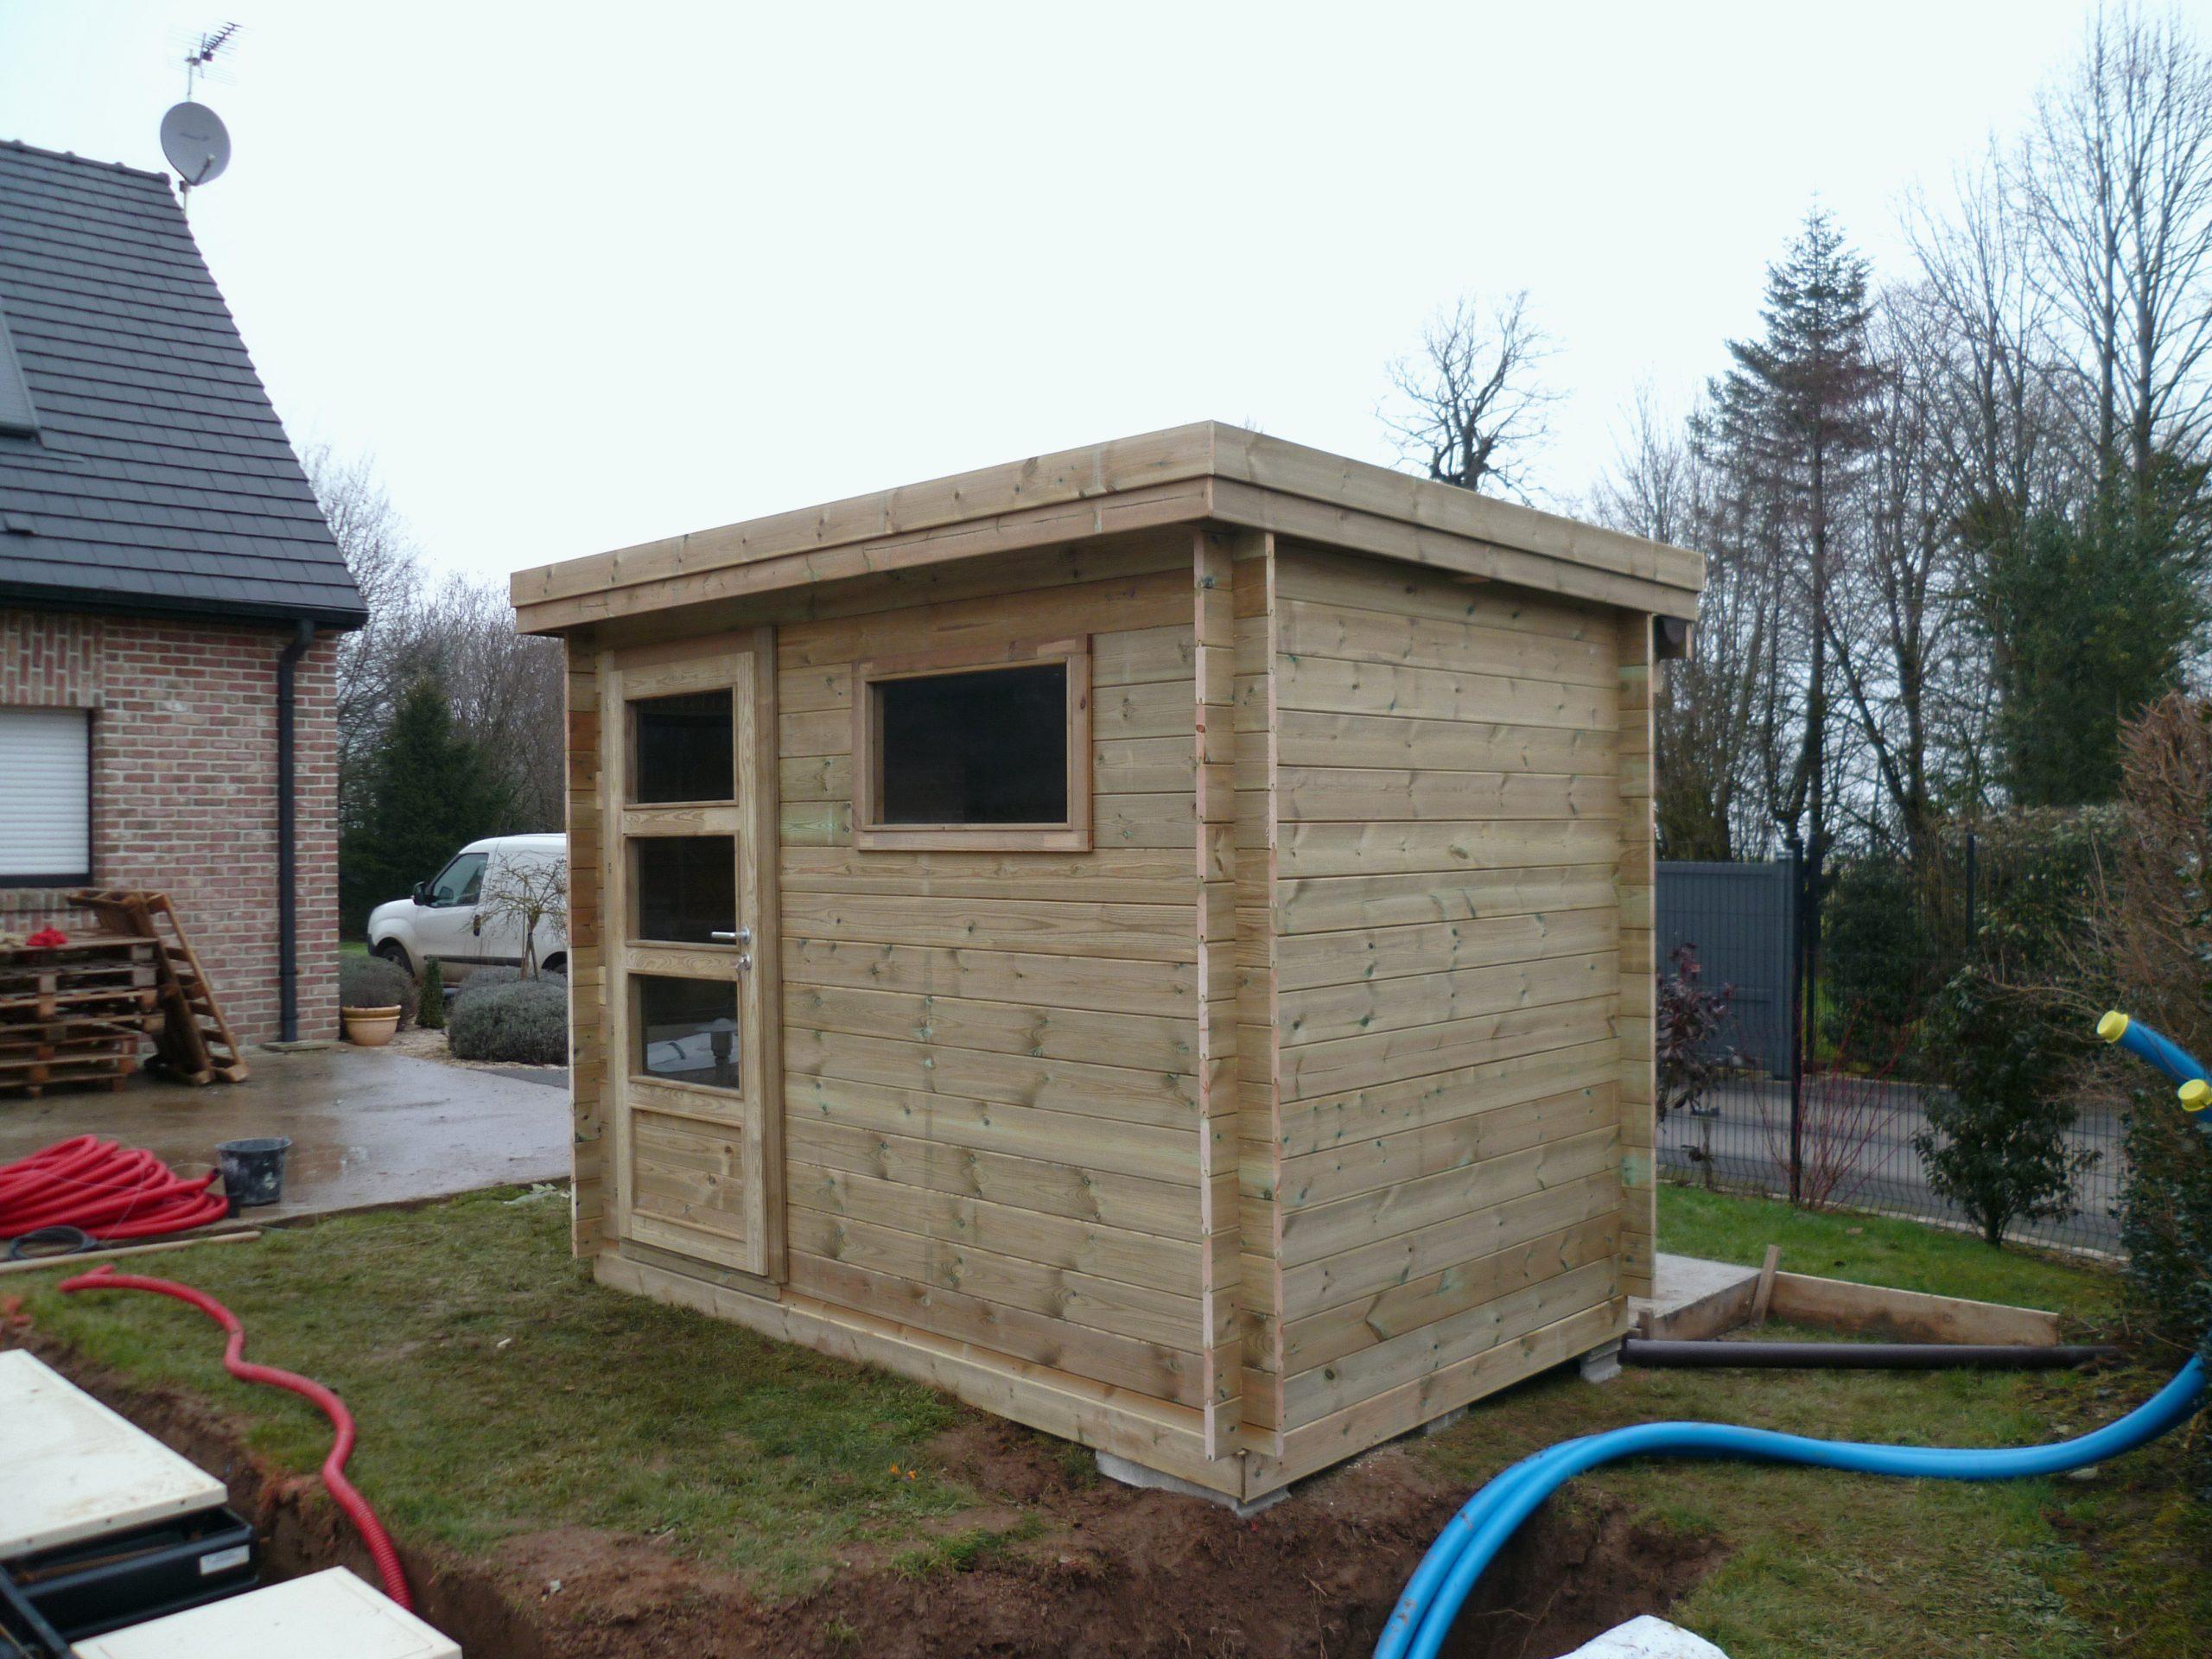 Rouleau Bitume Toiture Abri De Jardin Inspirant Gnial ... avec Construire Une Cabane De Jardin